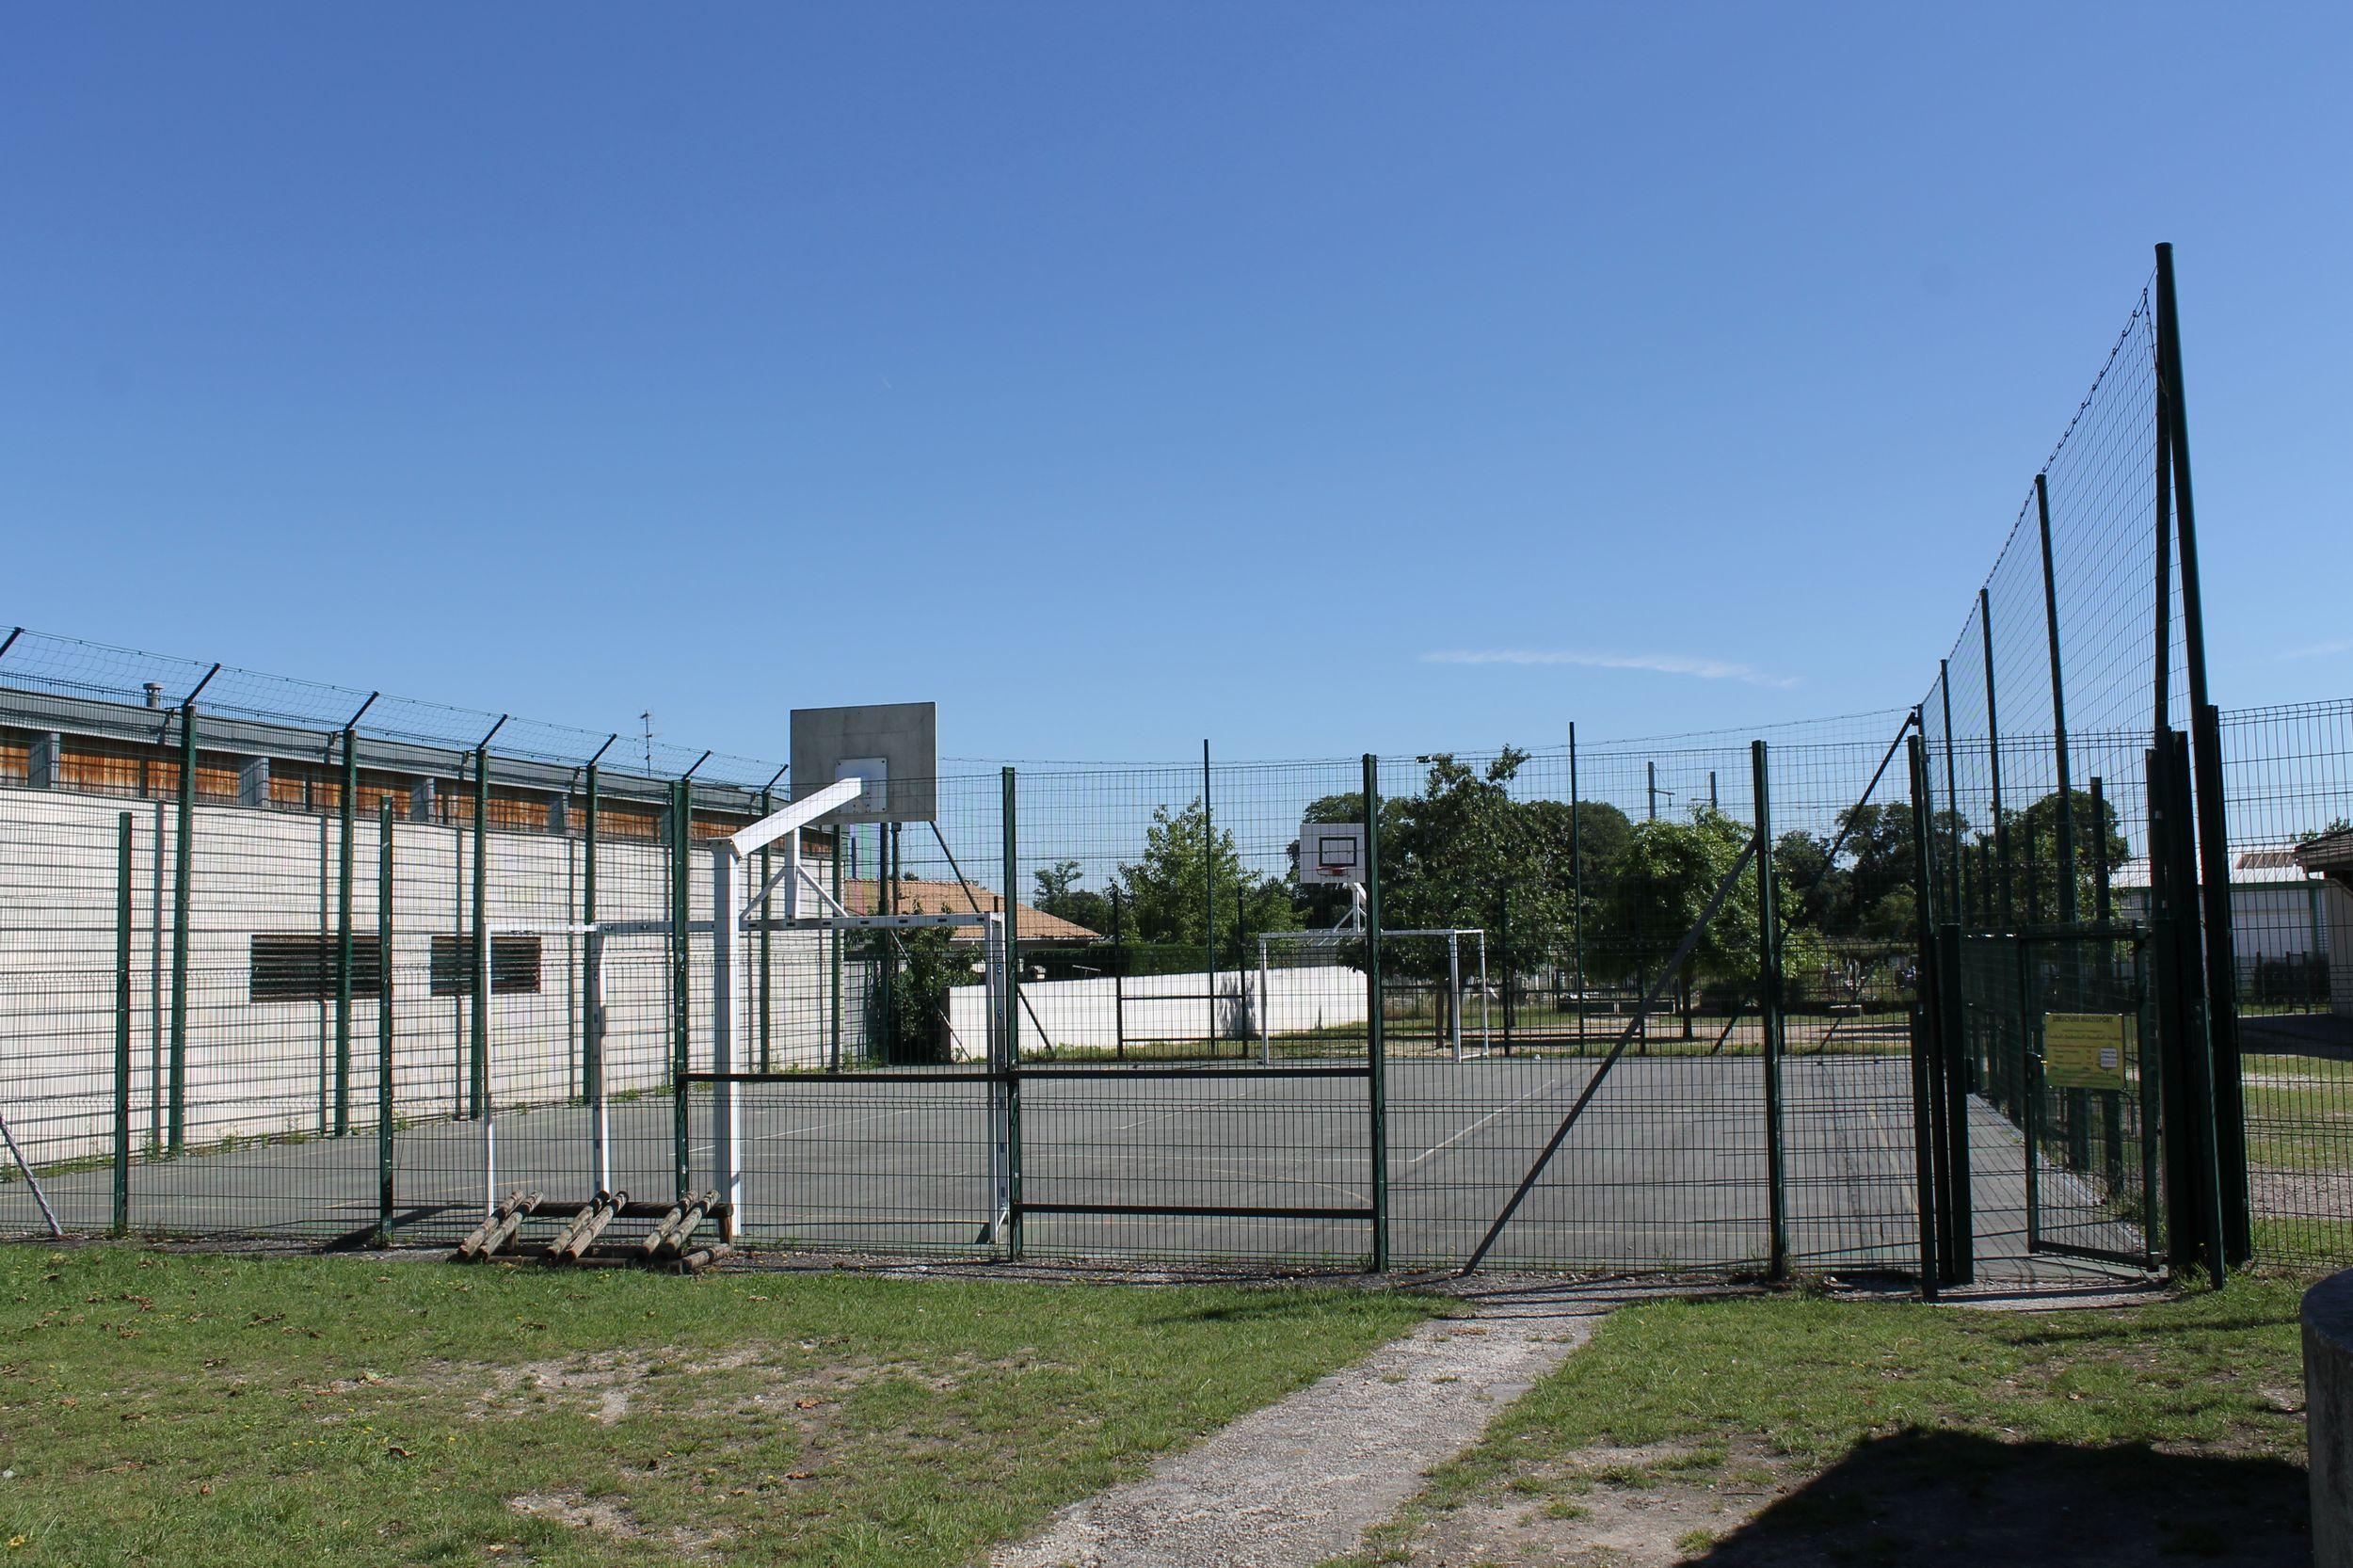 35-city-stade-1